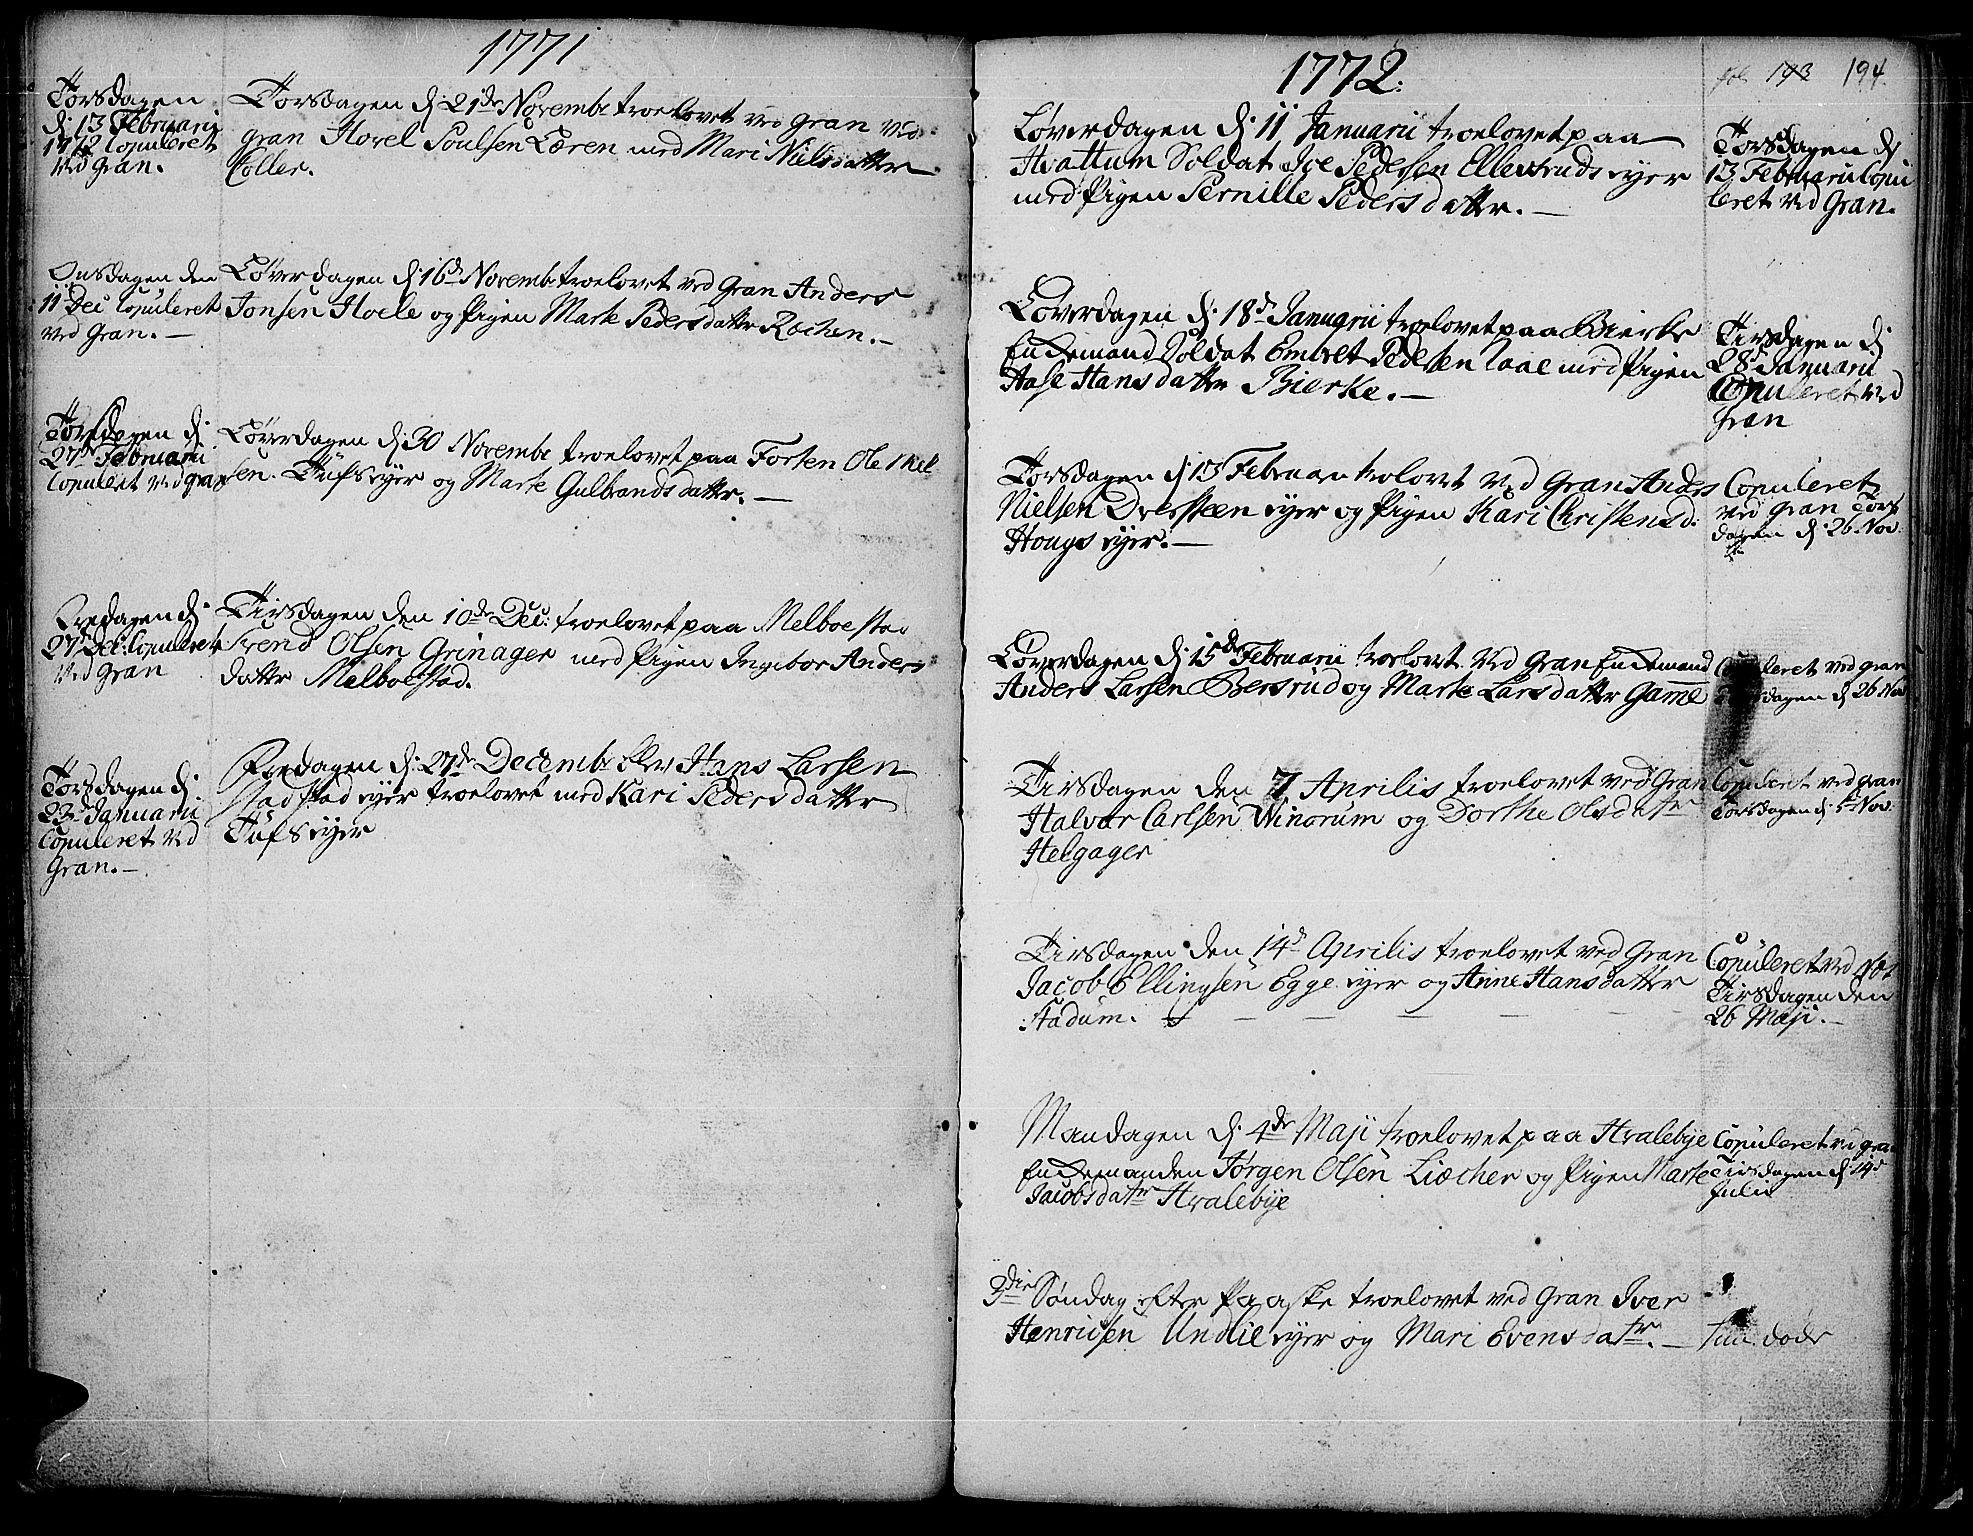 SAH, Gran prestekontor, Ministerialbok nr. 4, 1759-1775, s. 194